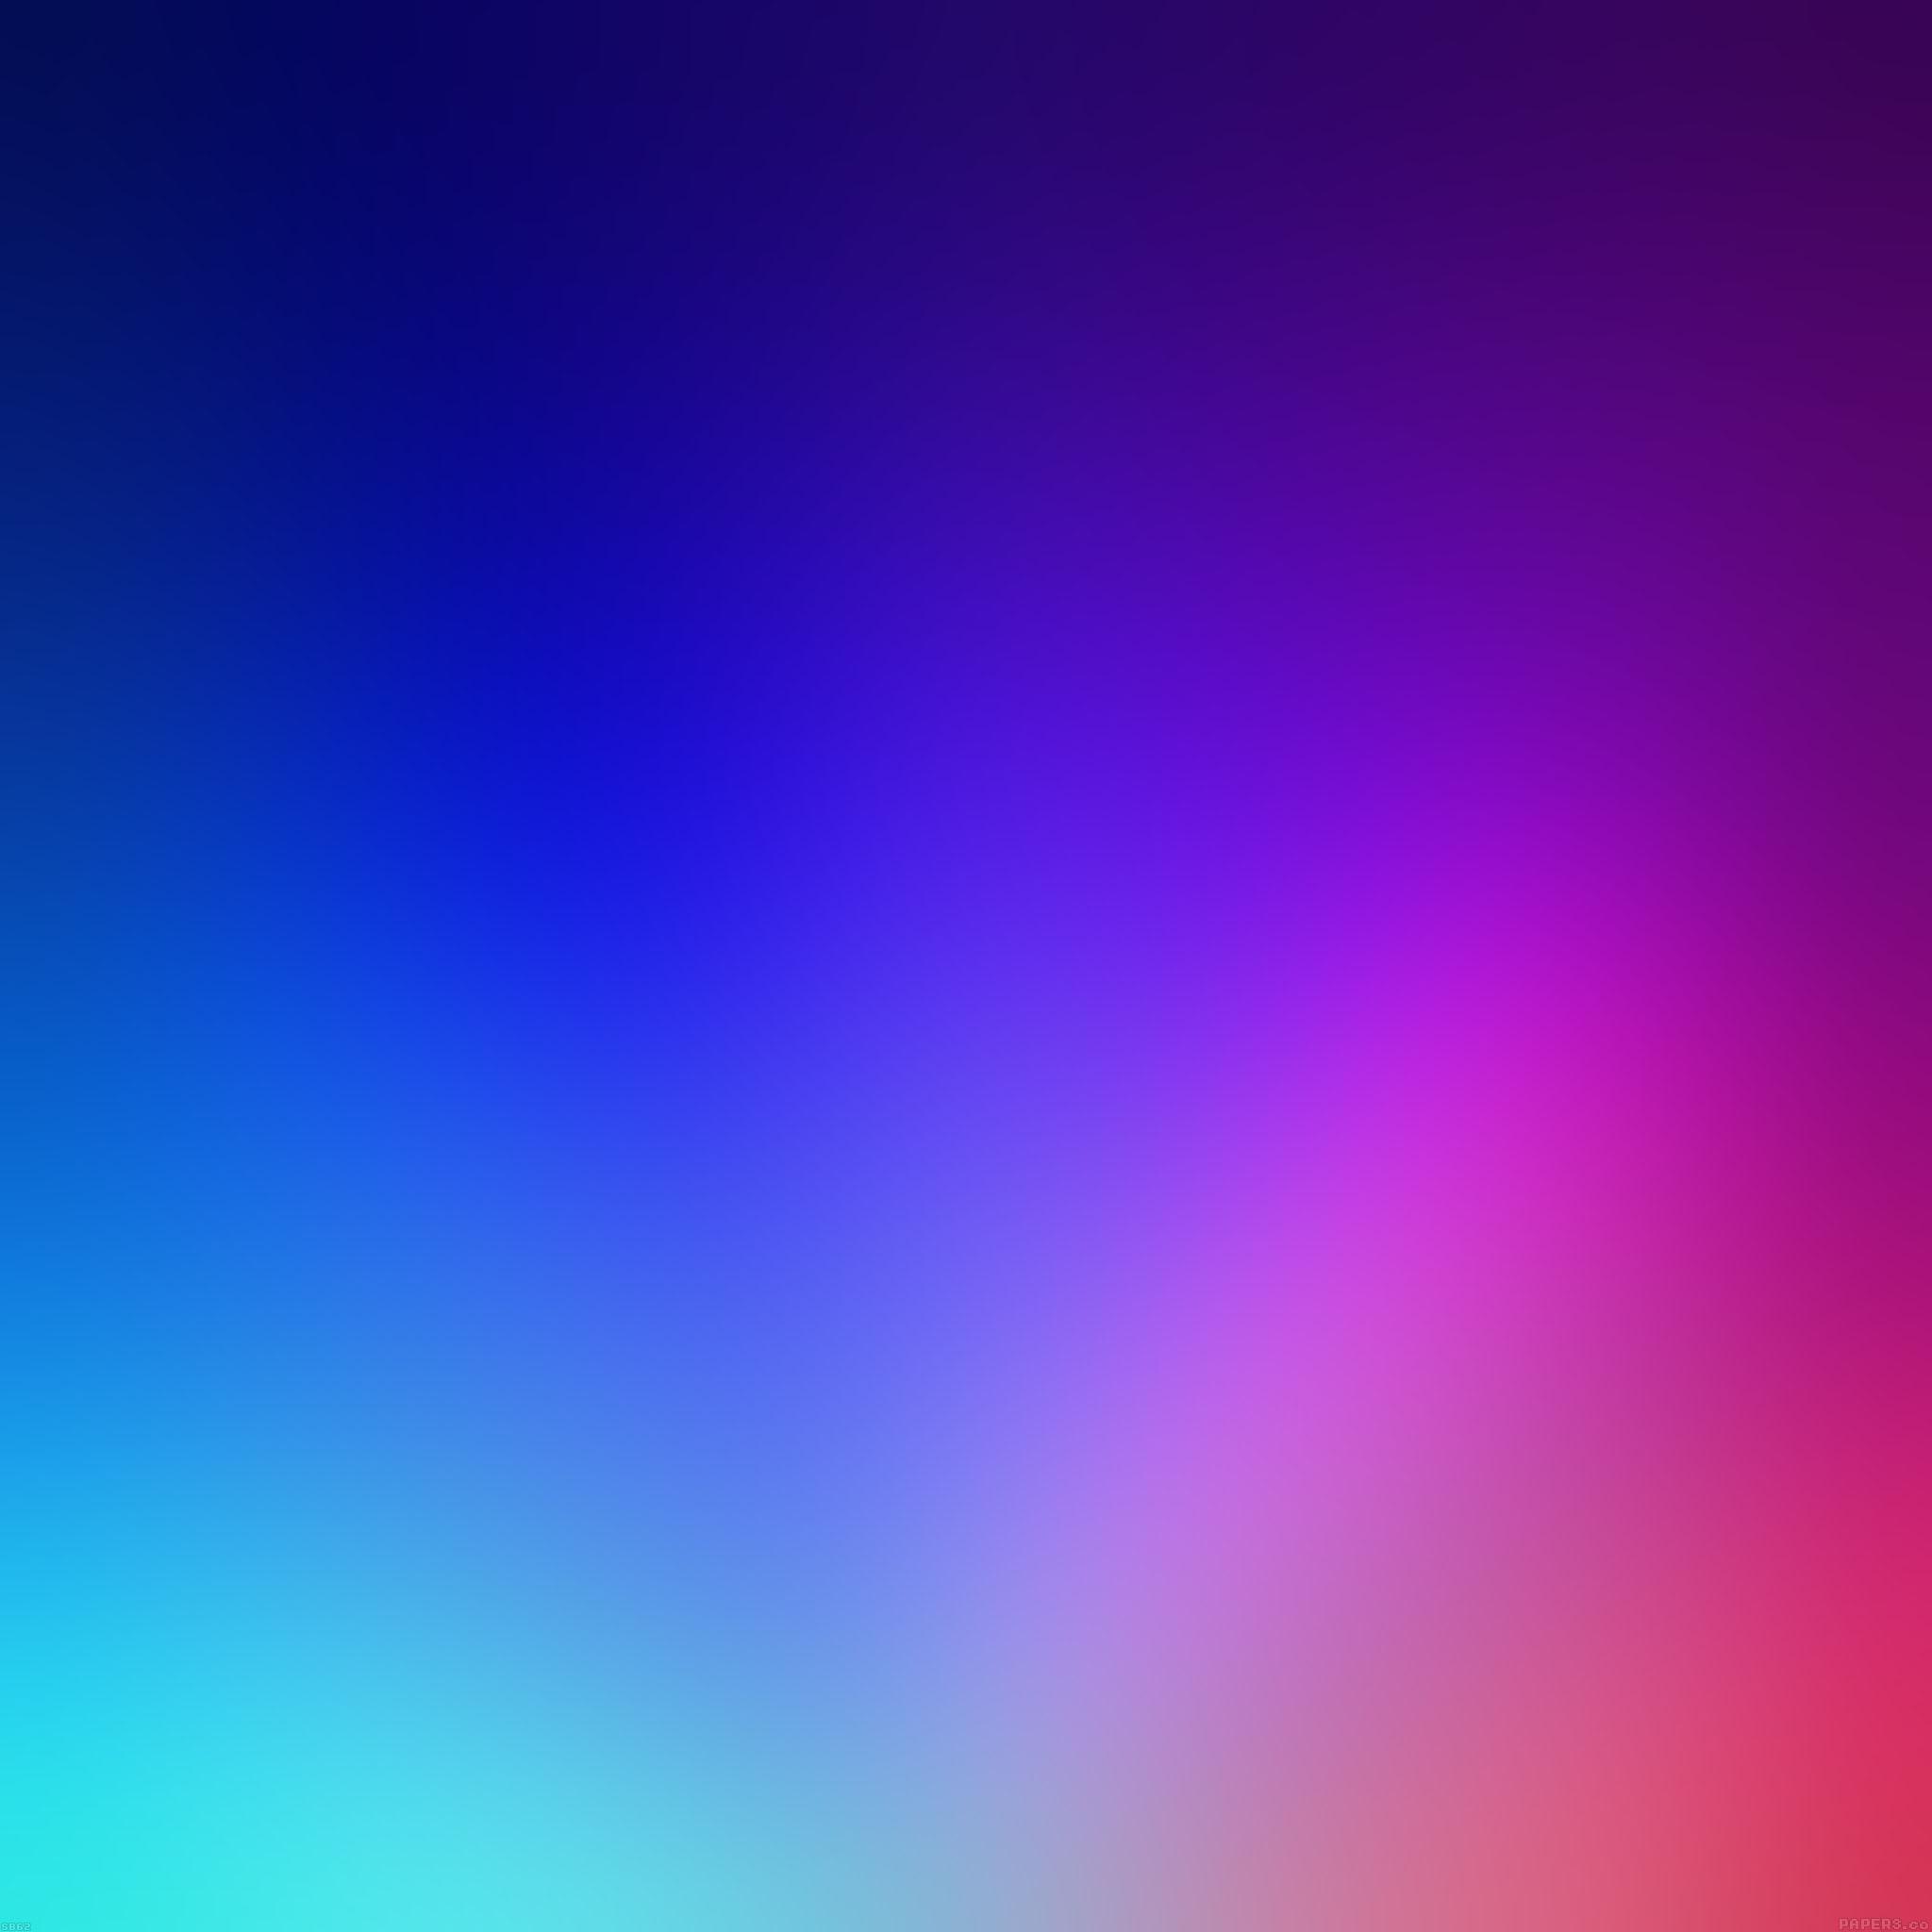 FREEIOS7 | sb62-wallpaper-rainbow-blue-lights-patterns ...